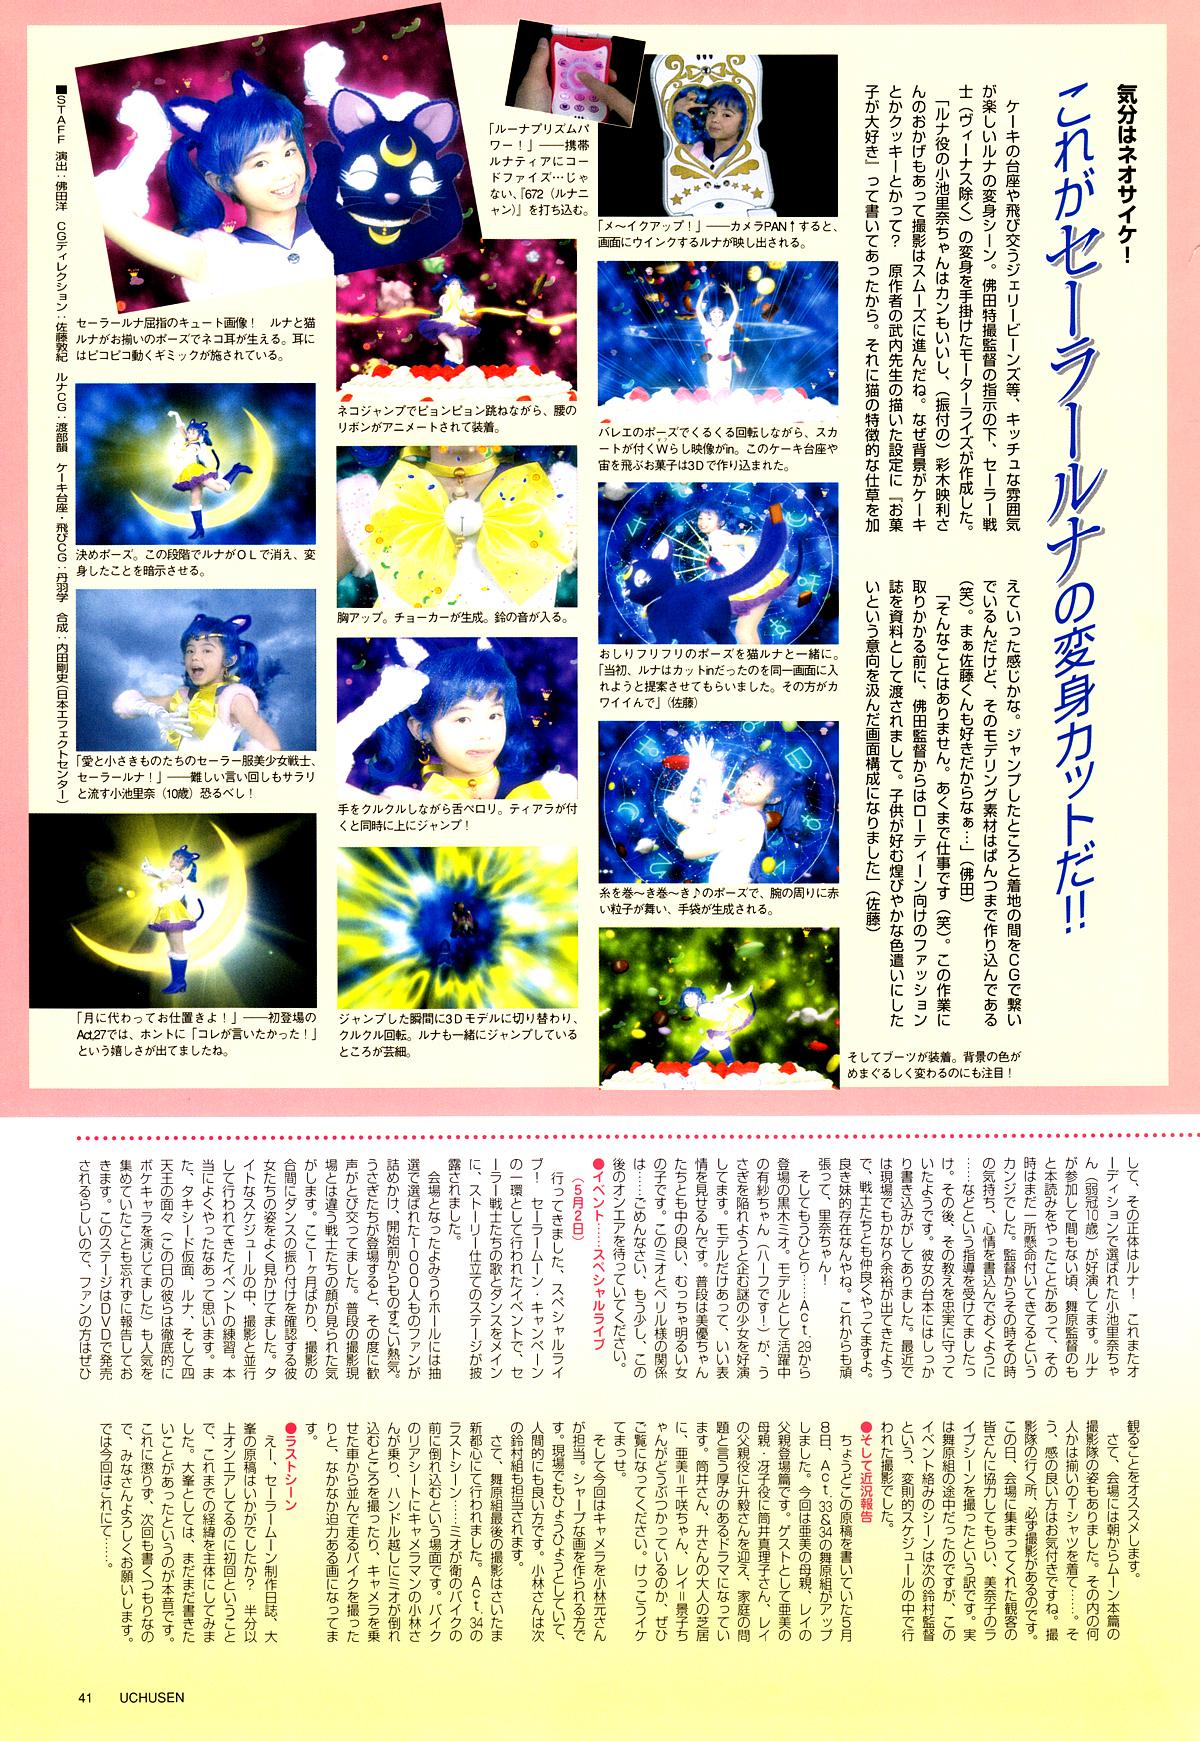 Uchusen_july_2004_04